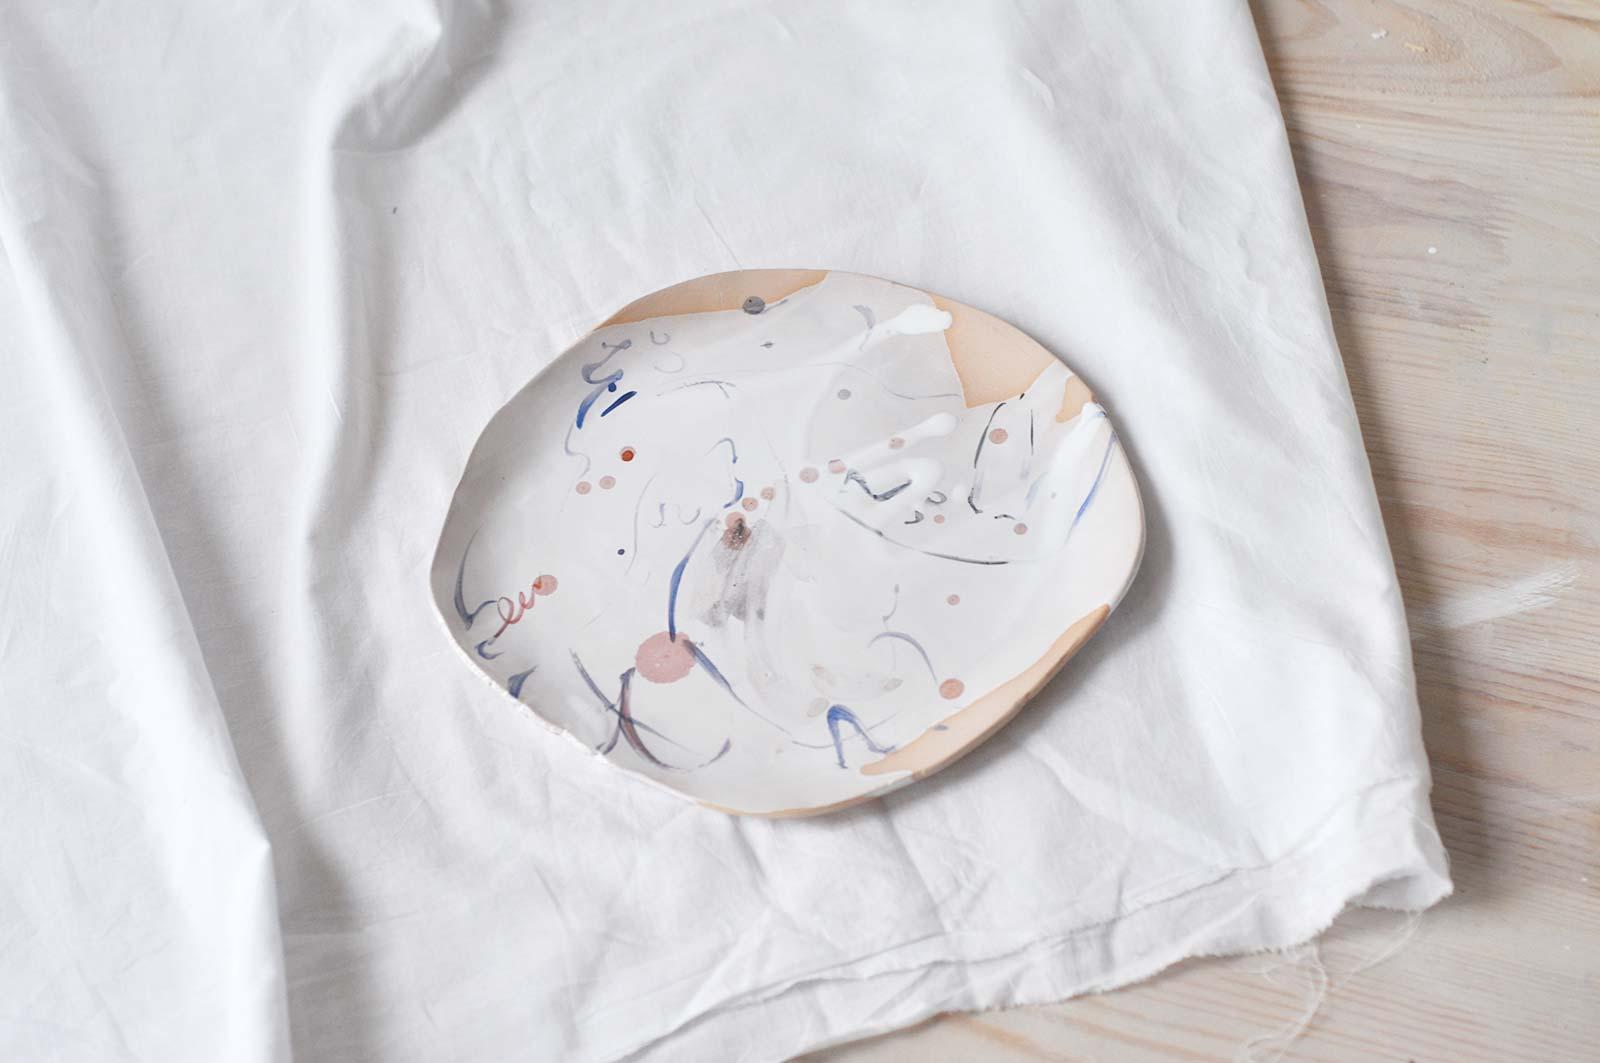 Вид спереди - Декоративная тарелка (Ручная работа)